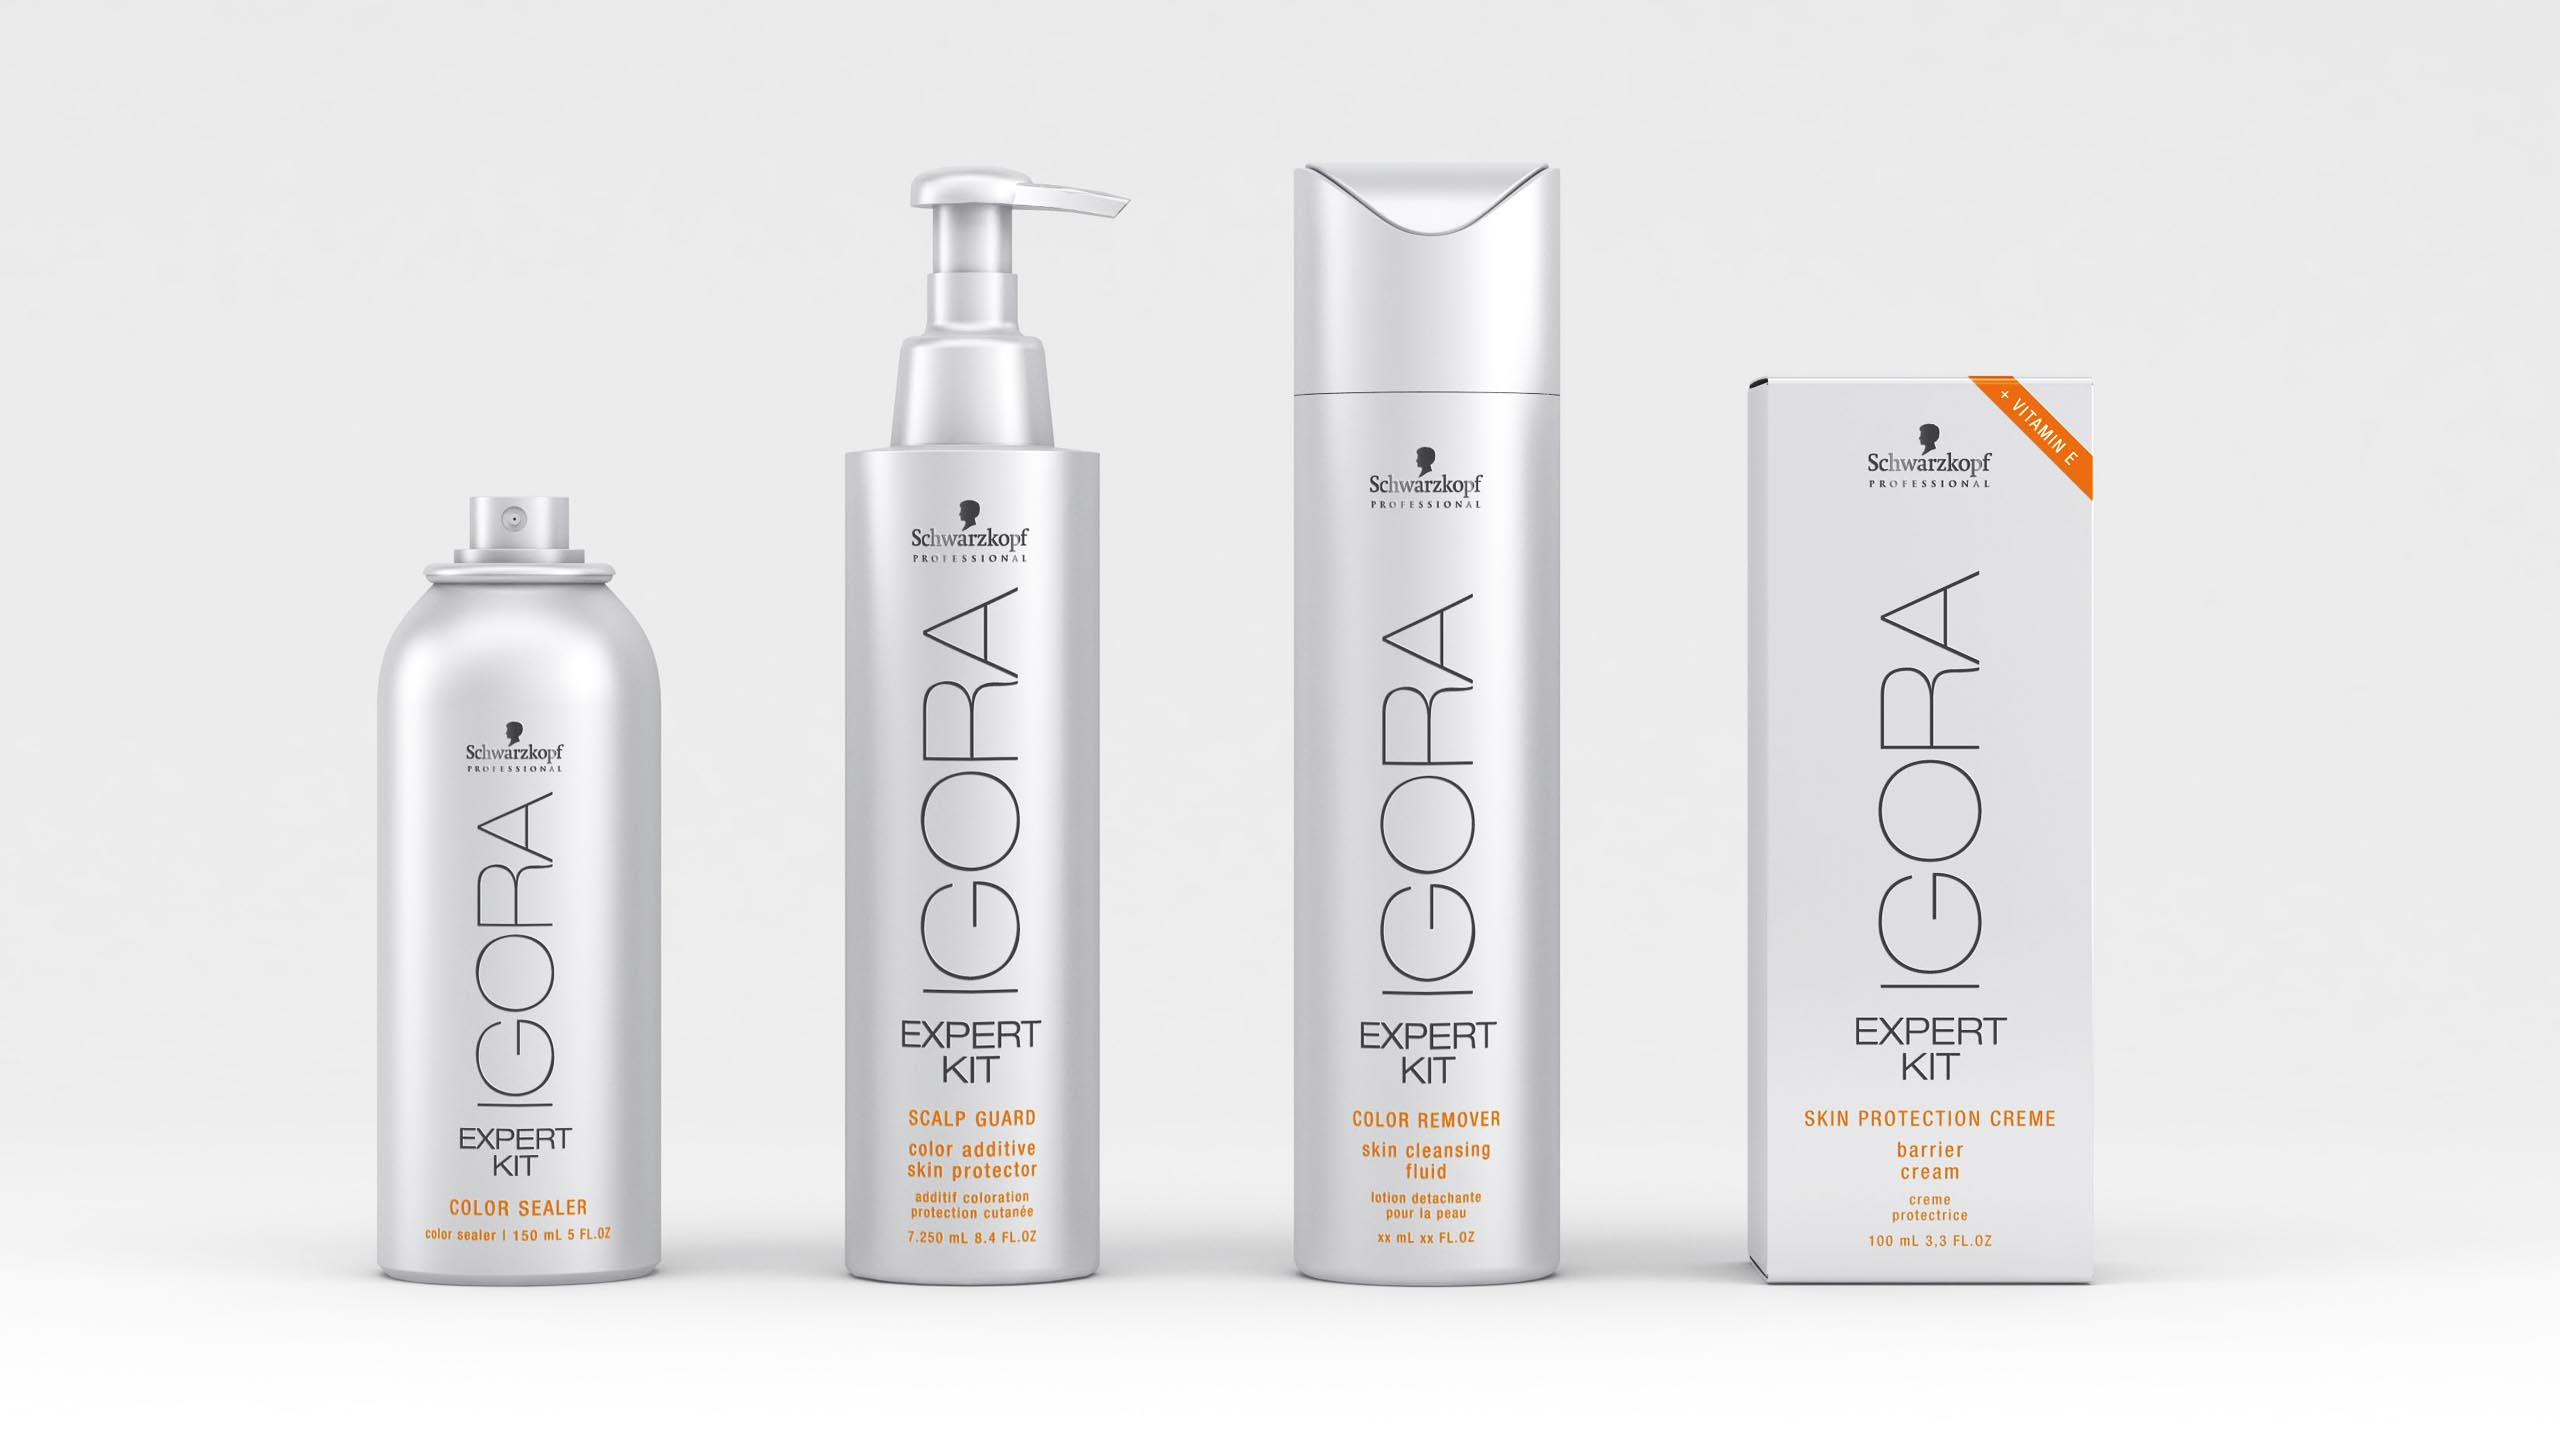 brand design of Igora Royal for Schwarzopf Professional